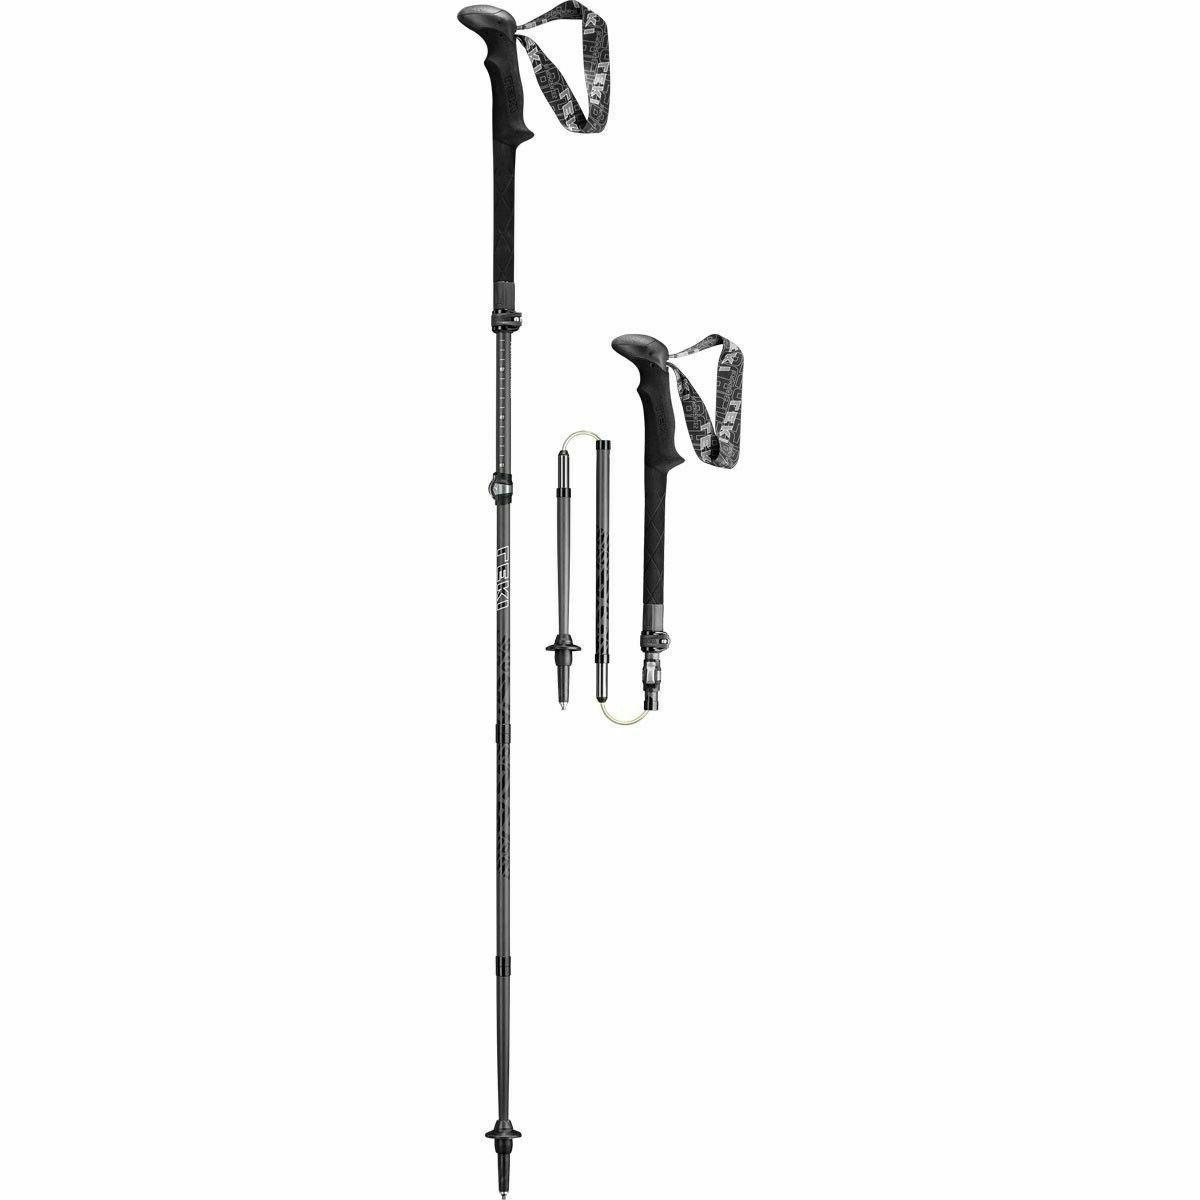 micro vario carbon trekking poles t6432900 color